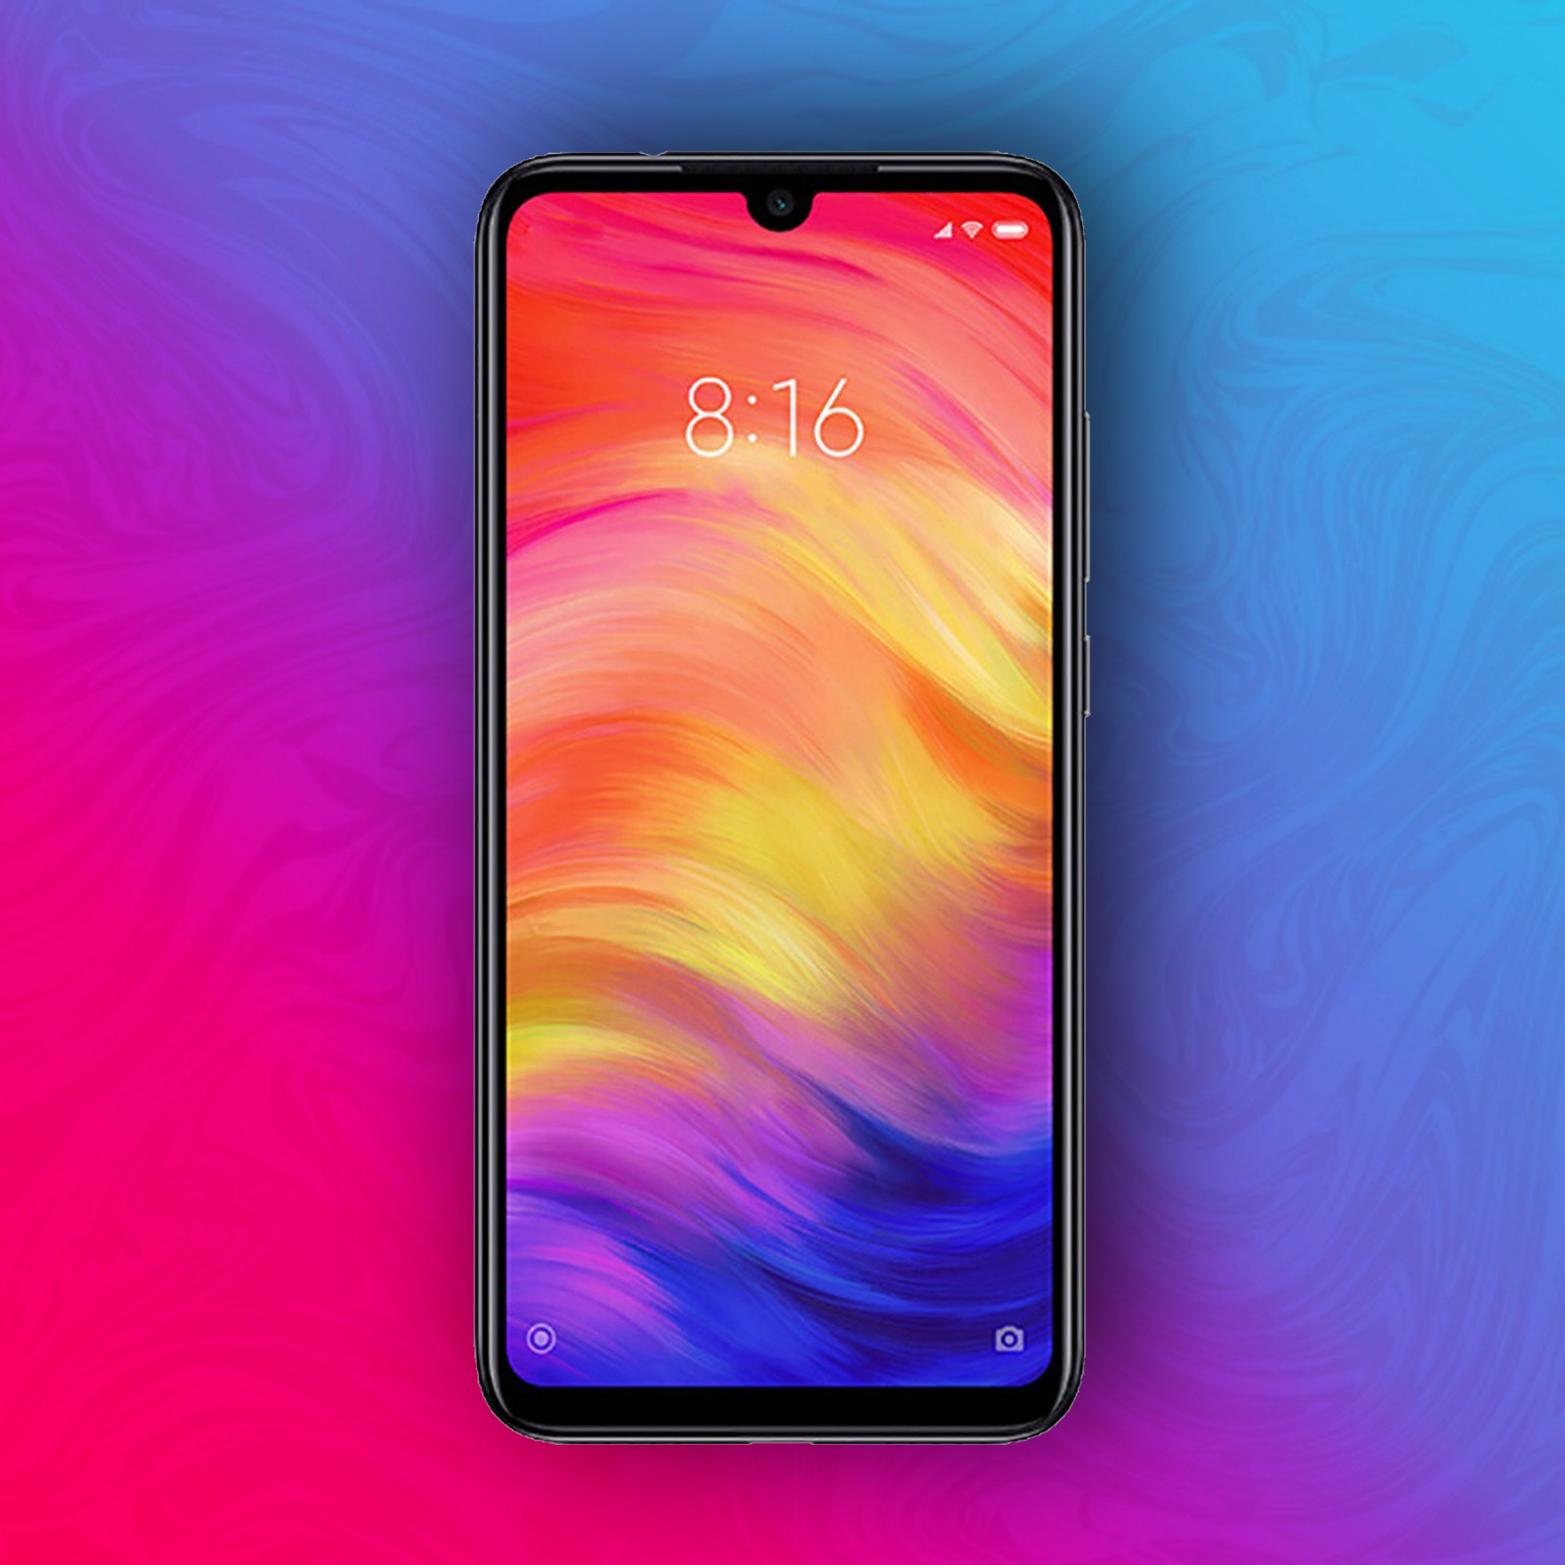 Xiaomi Redmi Note 7 32/3GB - Snapdragon 660 - 48MP+5MP Kamera   Global Version